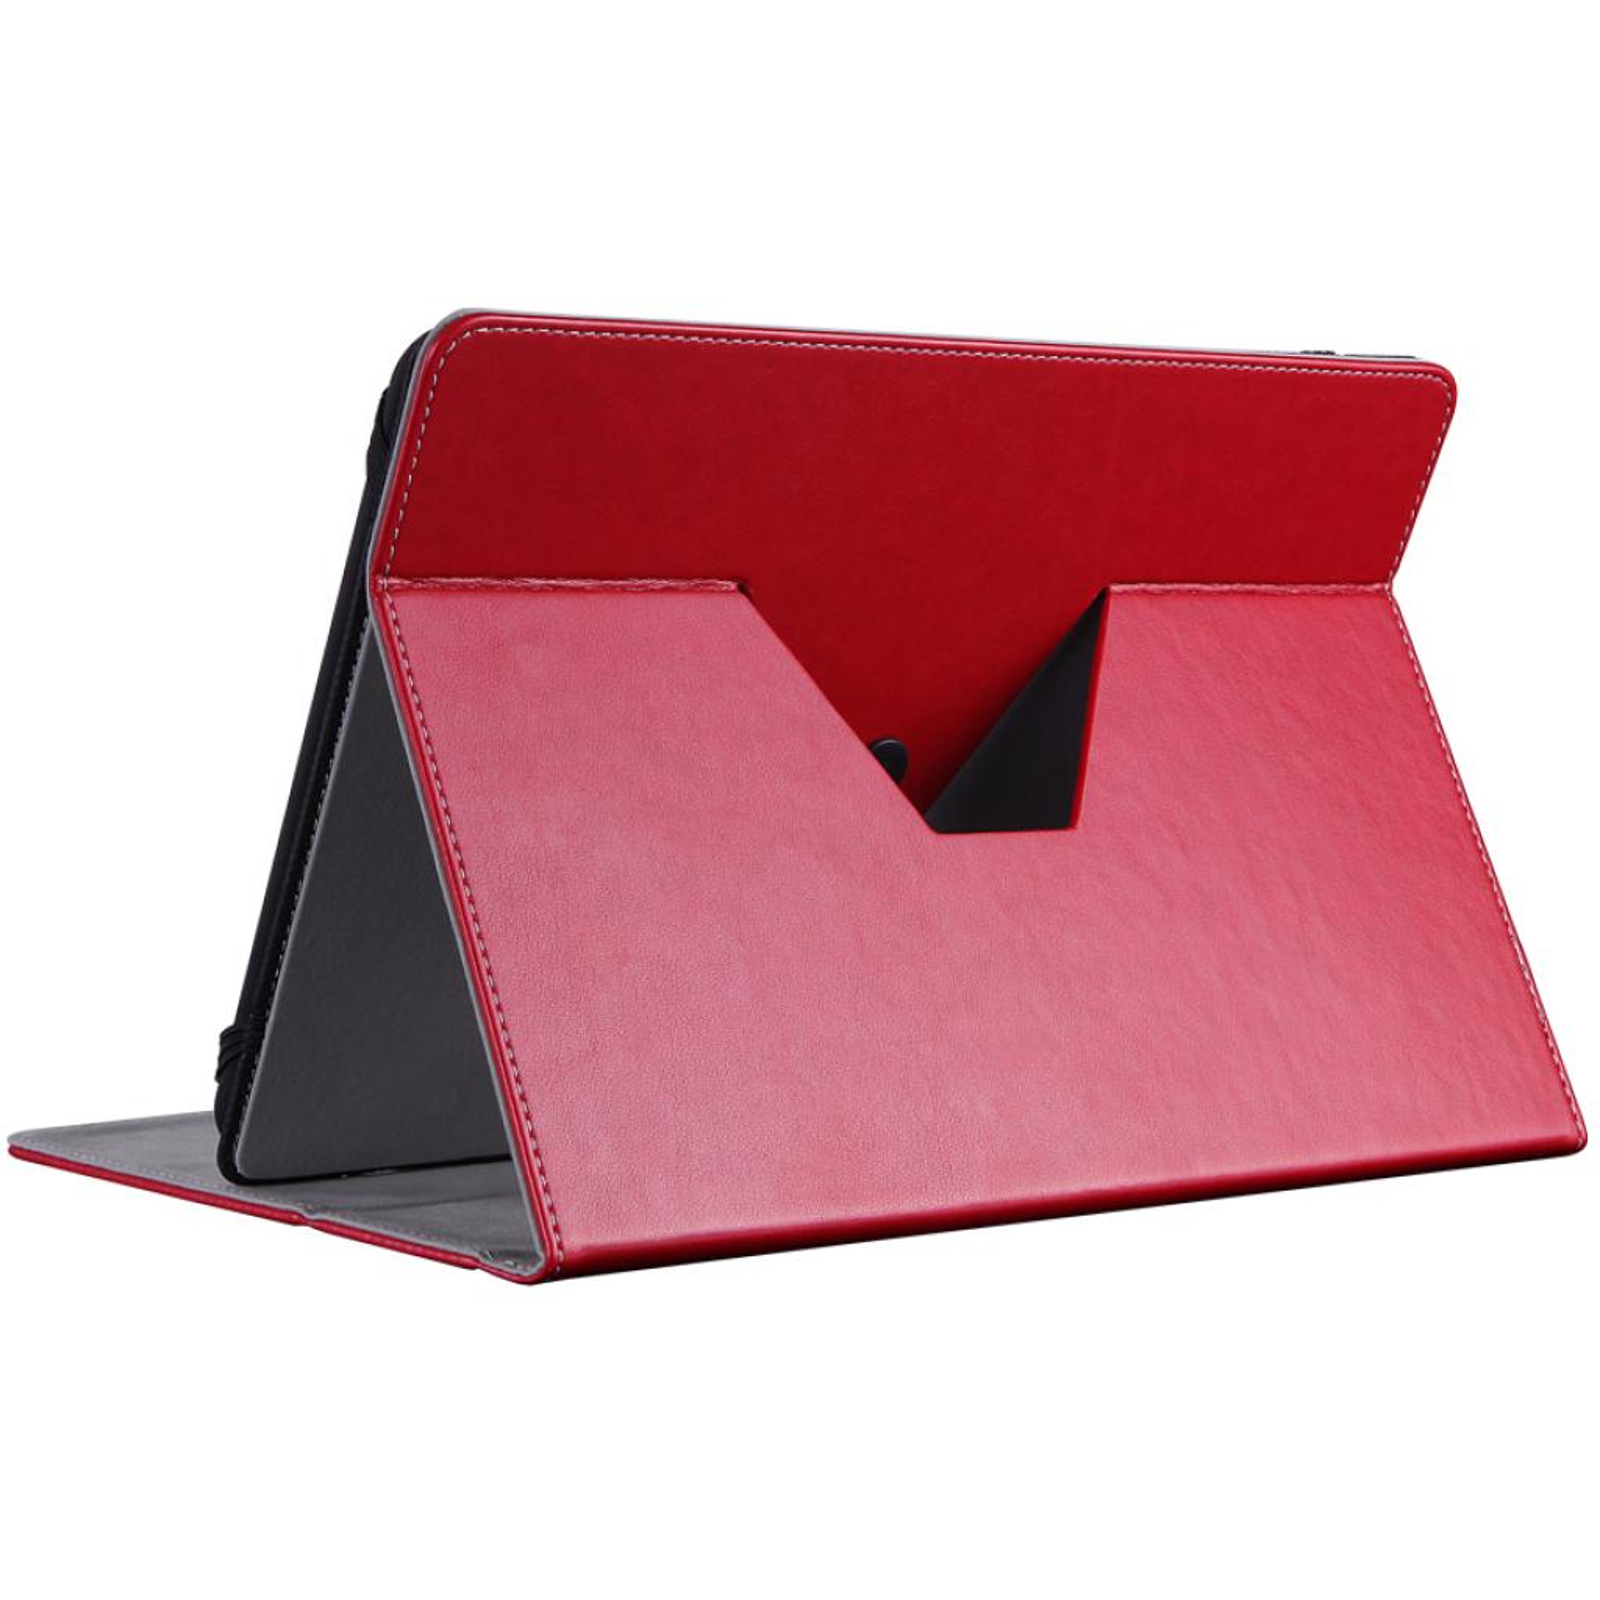 "Чехол для планшета PRESTIGIO 7"" Universal rotating RED (PTCL0207RD) изображение 6"